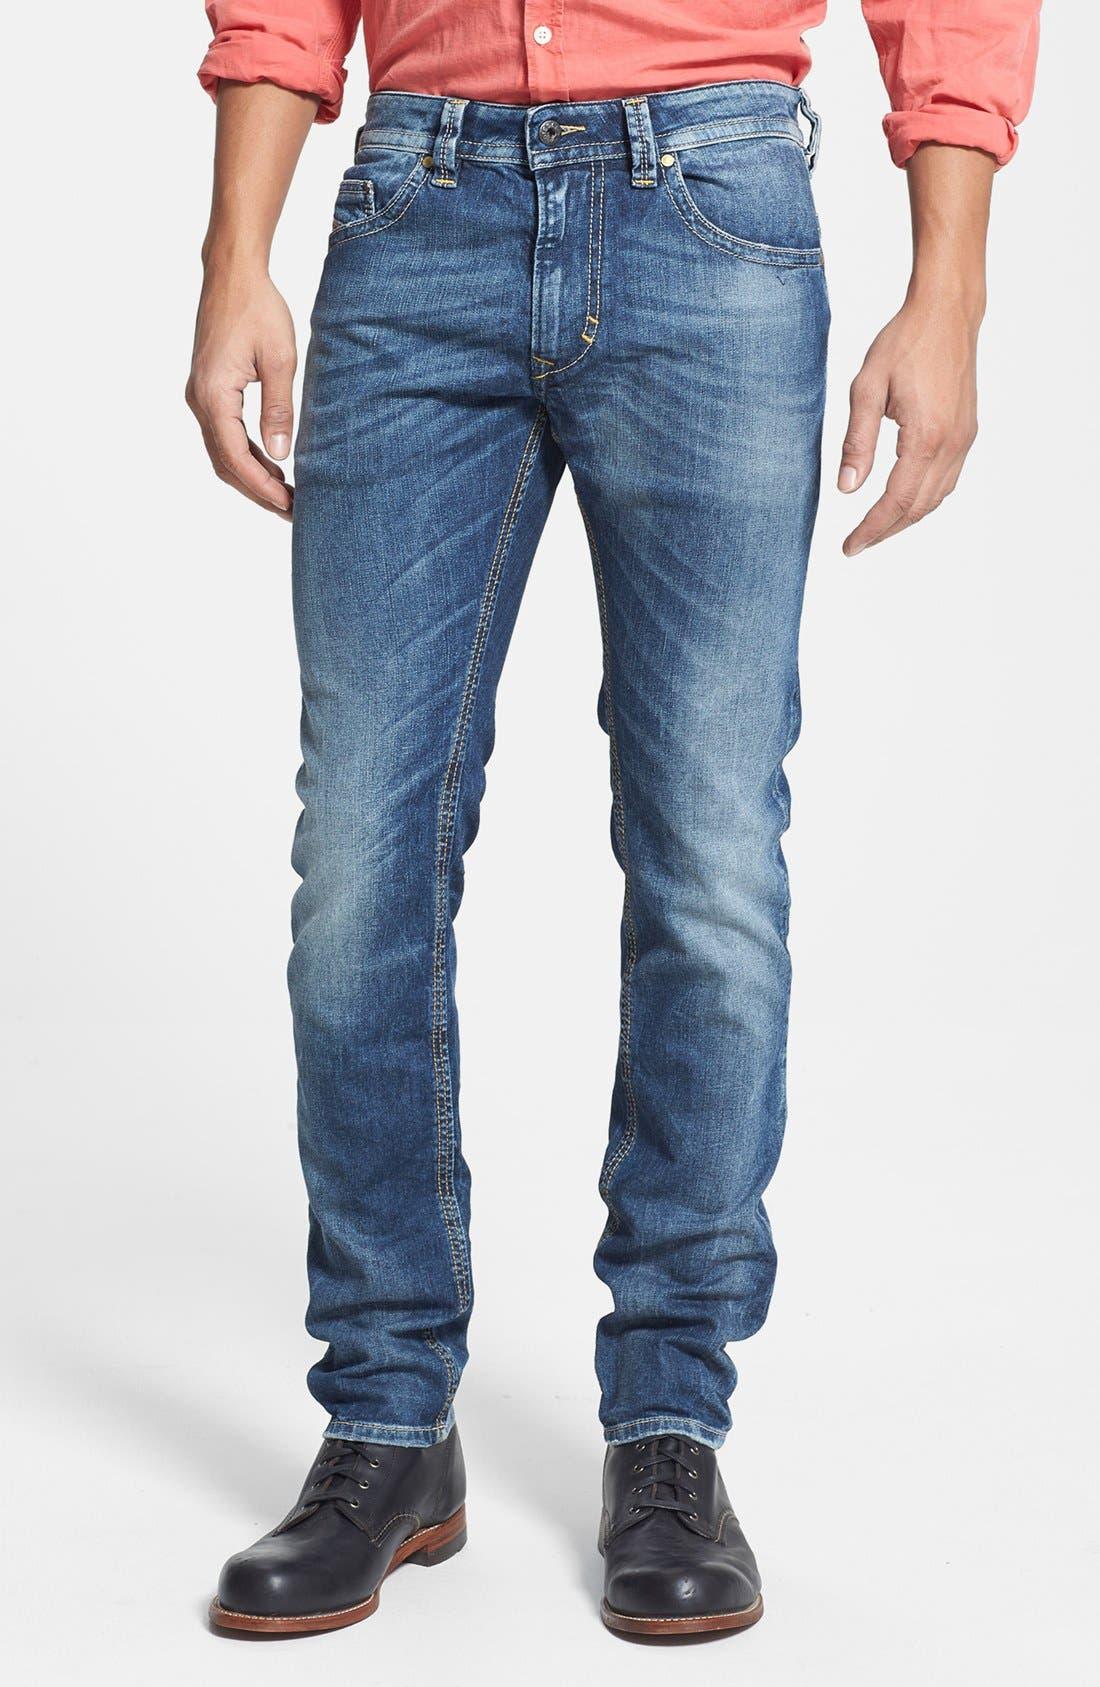 Alternate Image 1 Selected - DIESEL® 'Thavar' Skinny Fit Jeans (827I)